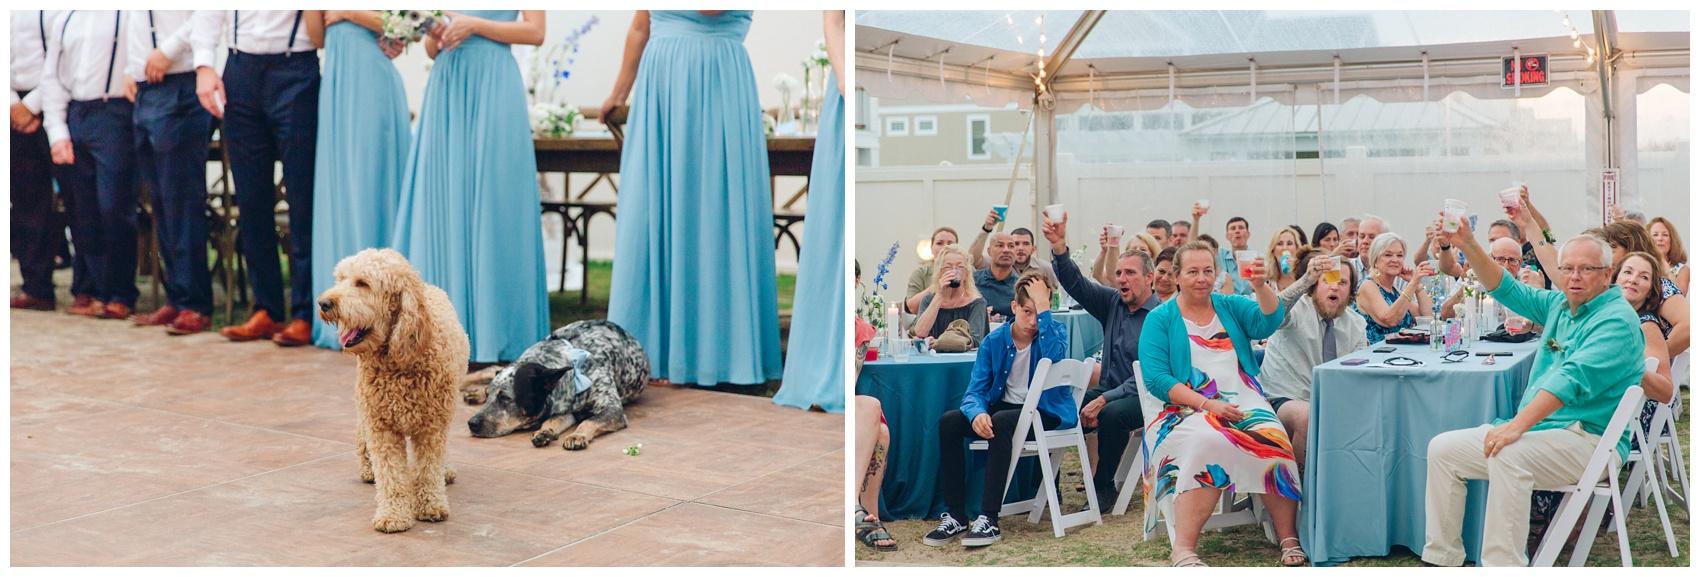 Outer-Banks-Corolla-Wedding_0121.jpg